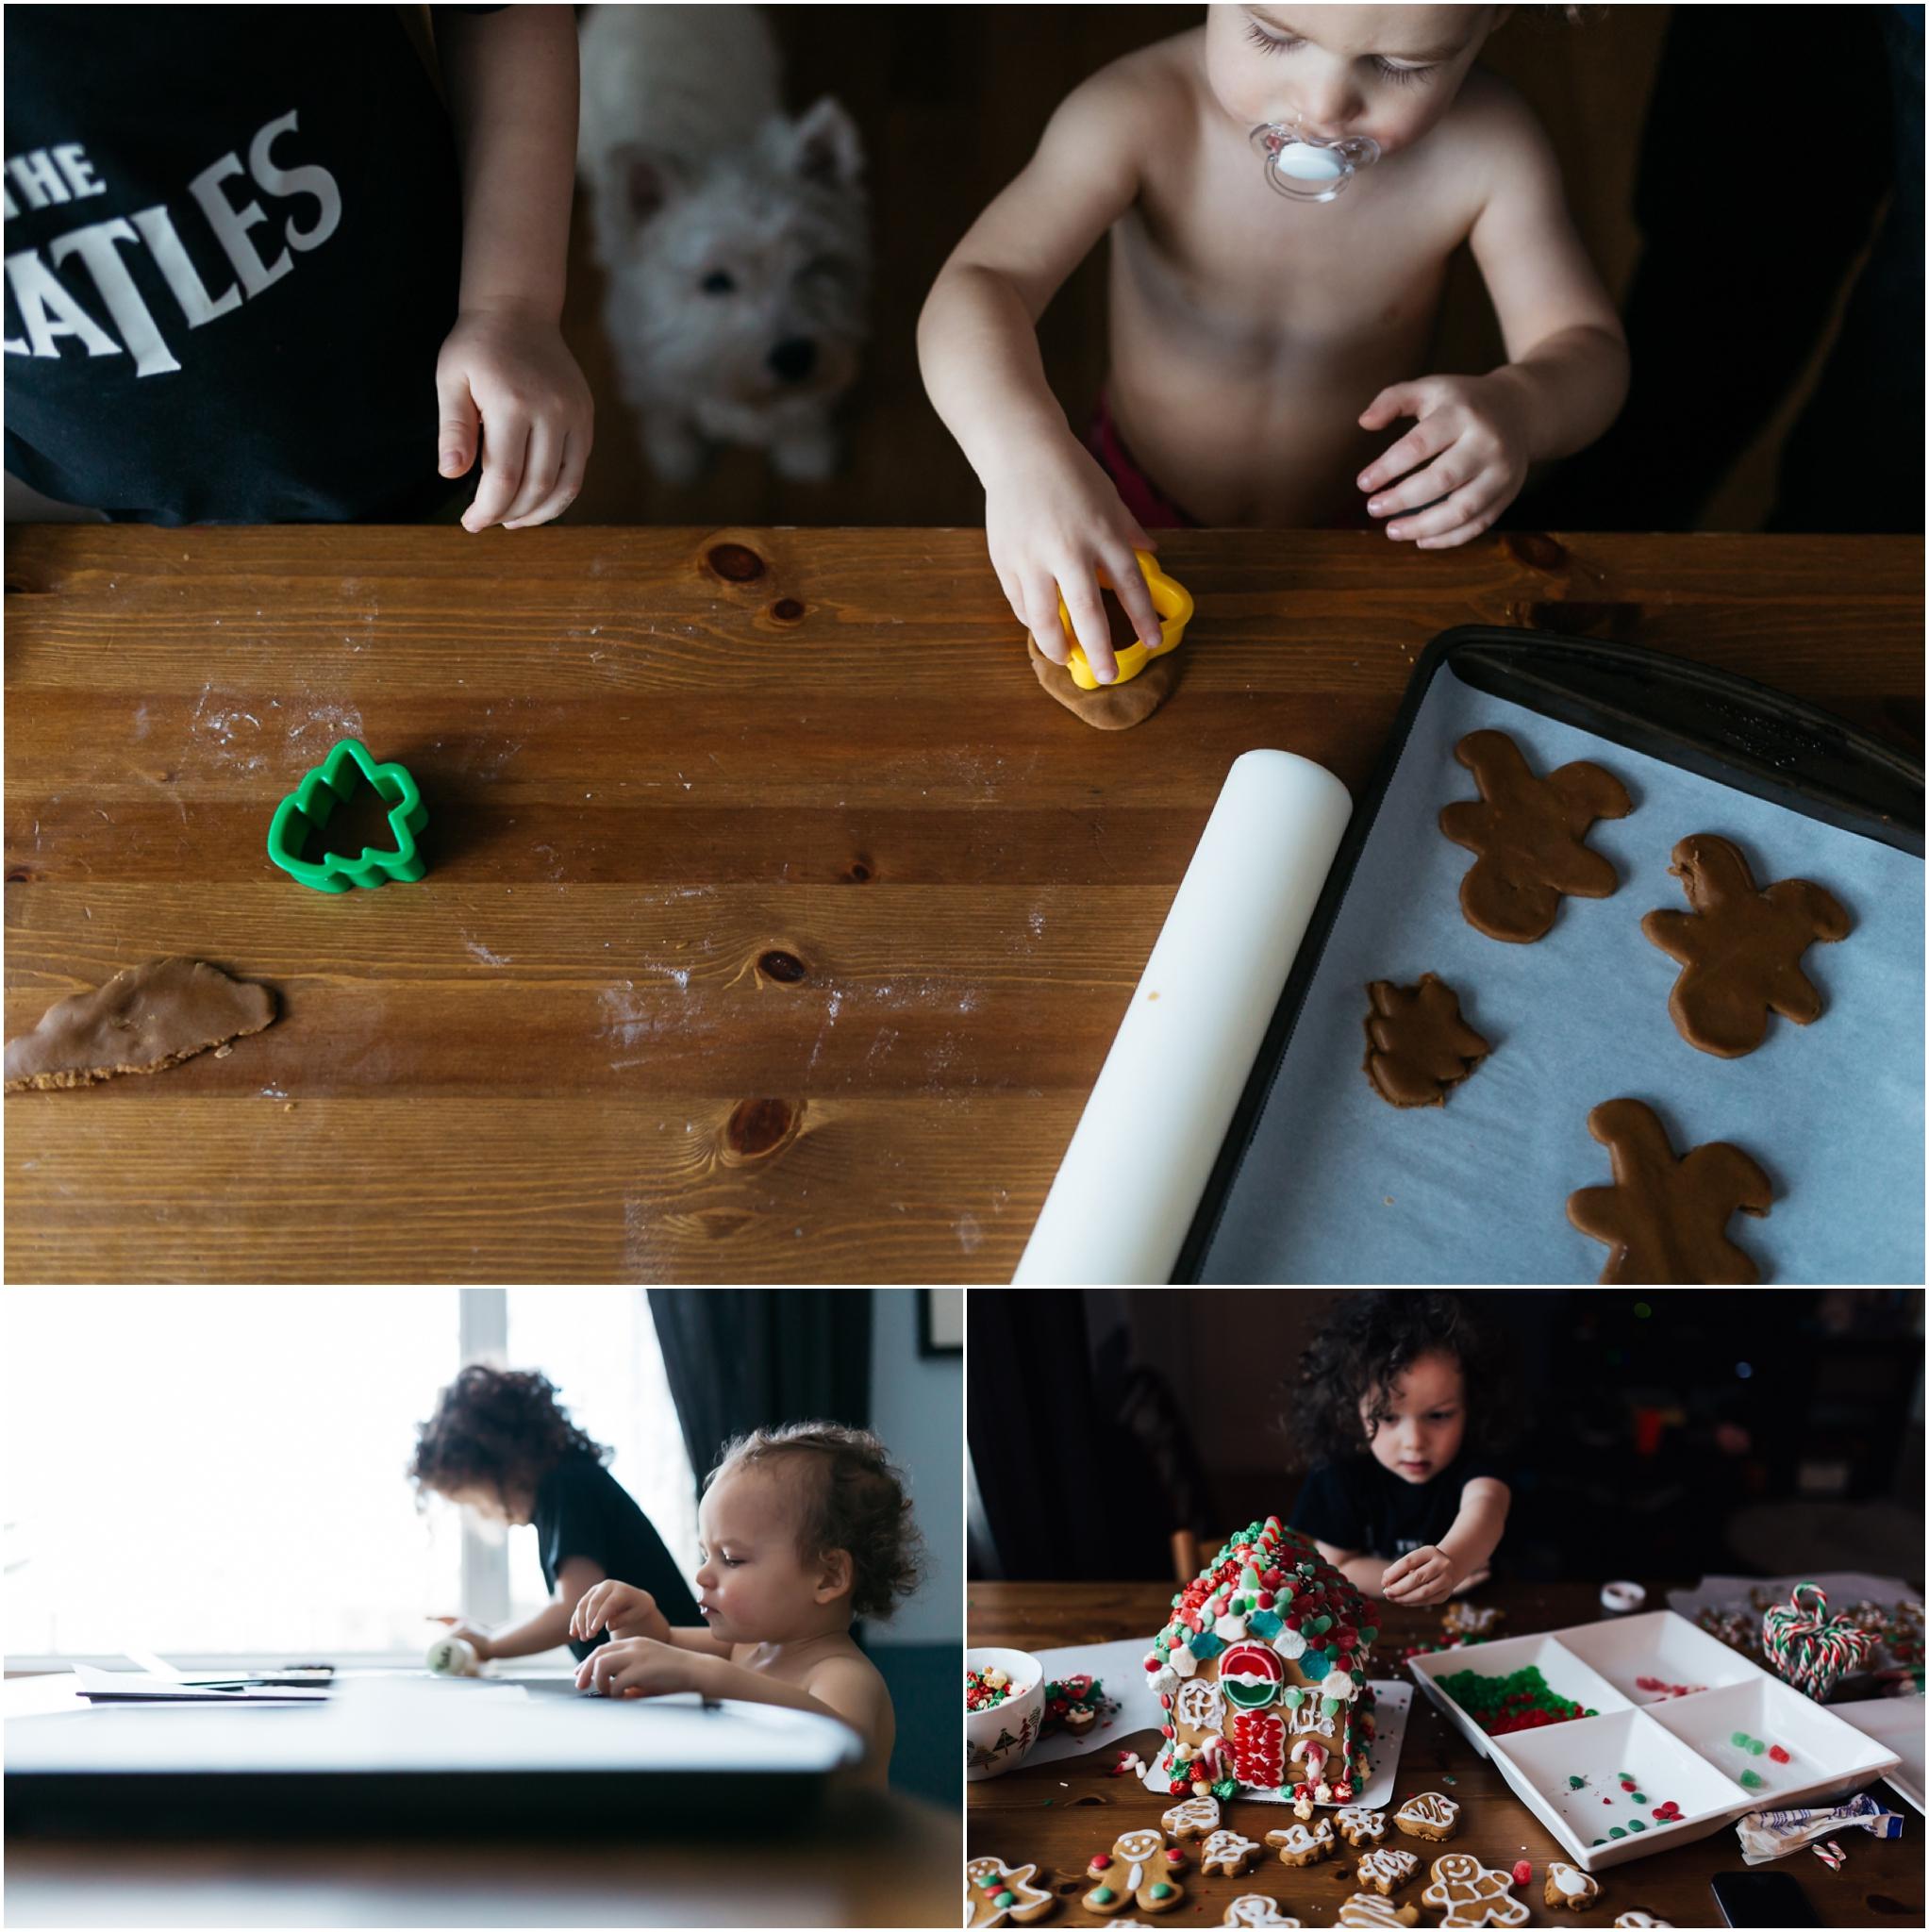 Edmonton Documentary Photographer - Best of 2016 - Cookie Making Decorating - Christmas - Cookies - Children - Holiday Baking - YEG